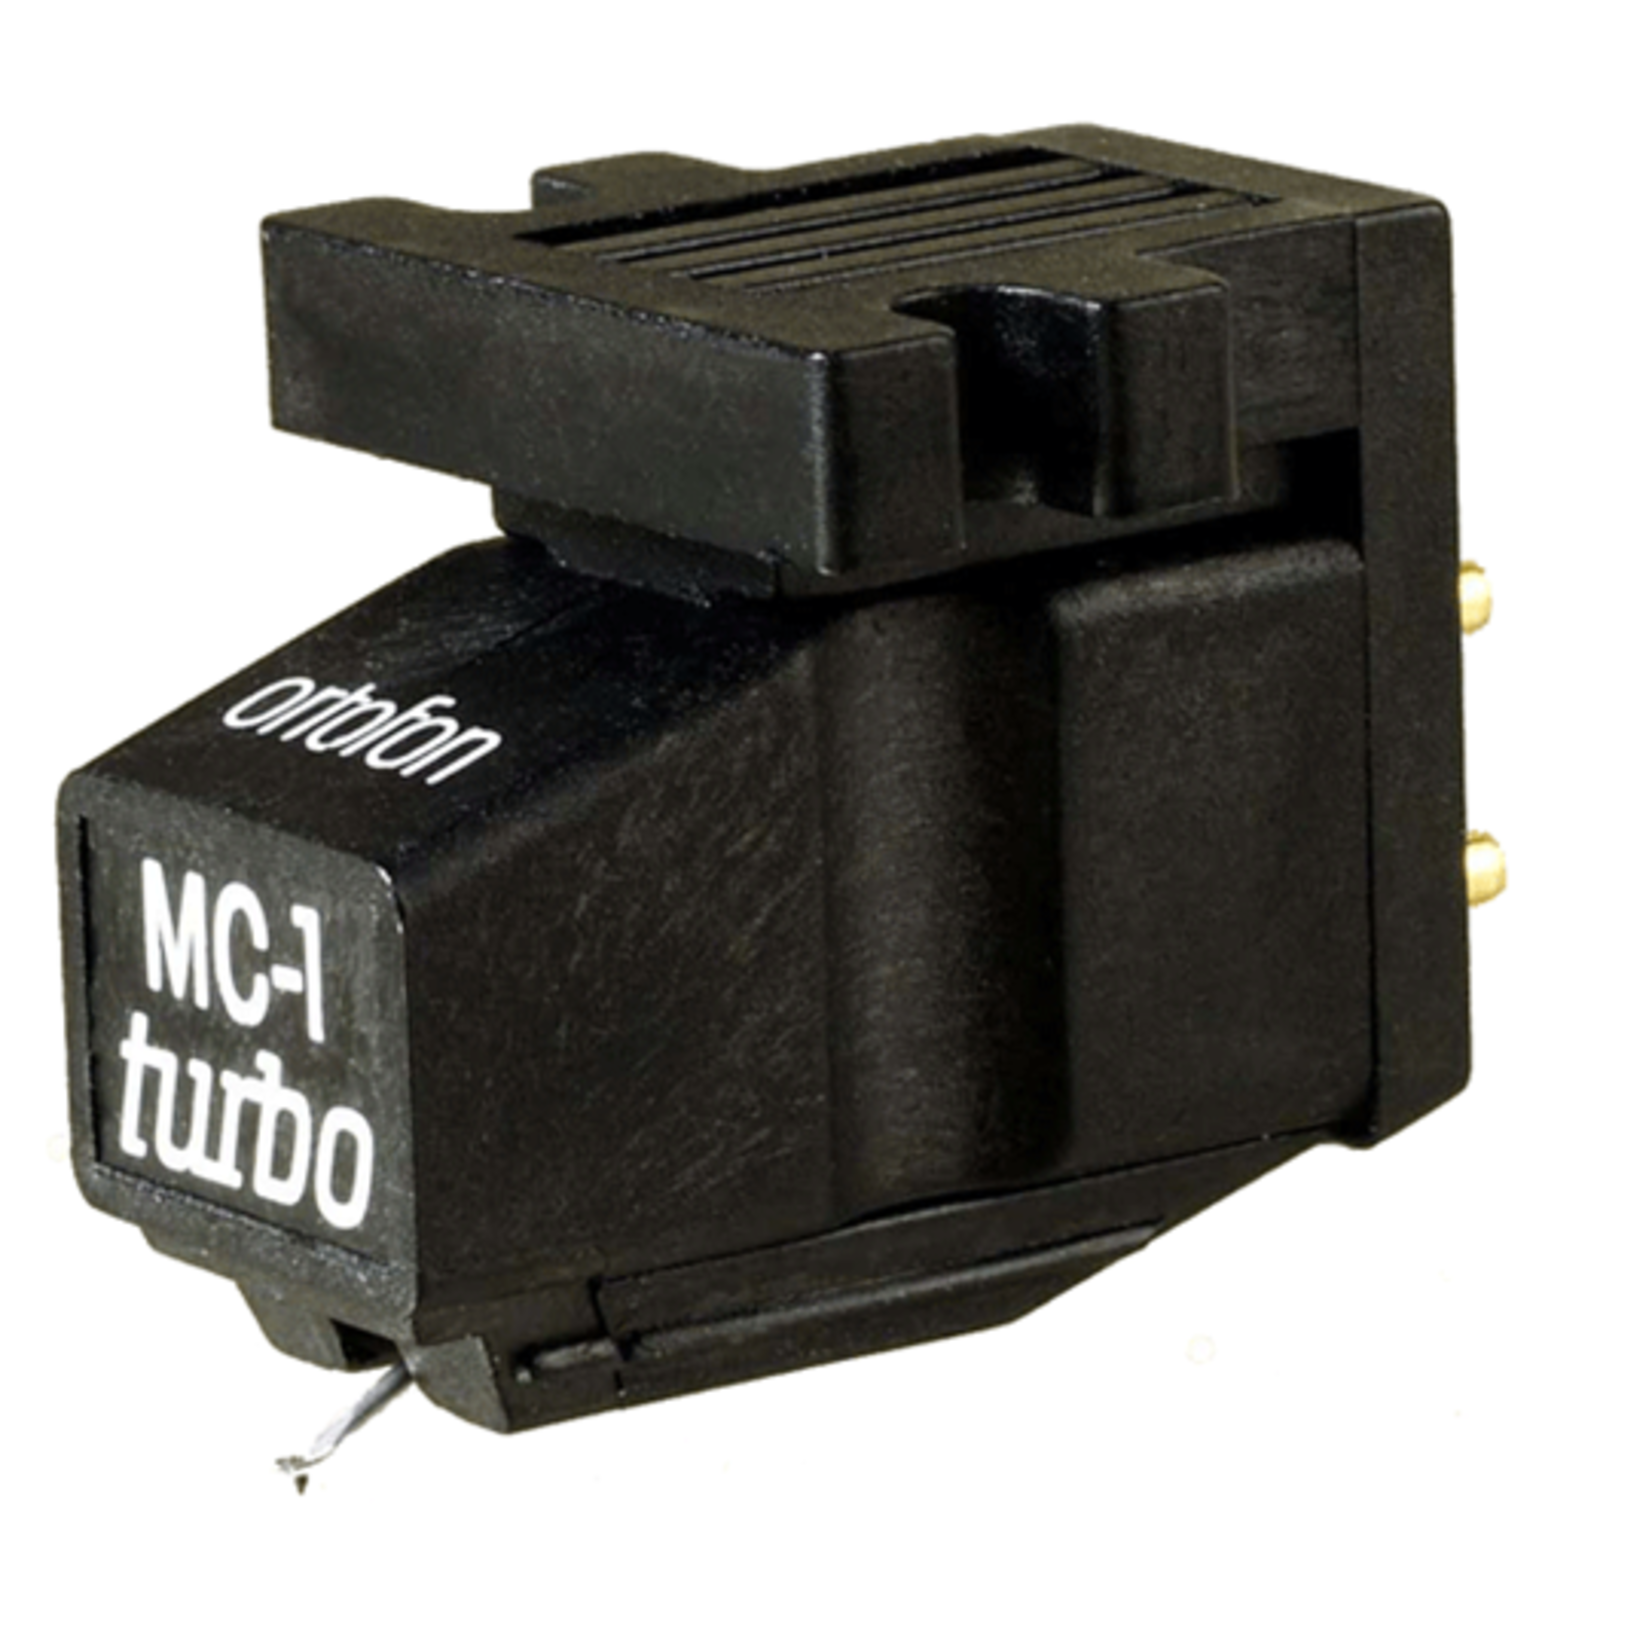 Accessory Ortofon MC1 Turbo High Output Moving Coil  (Used)